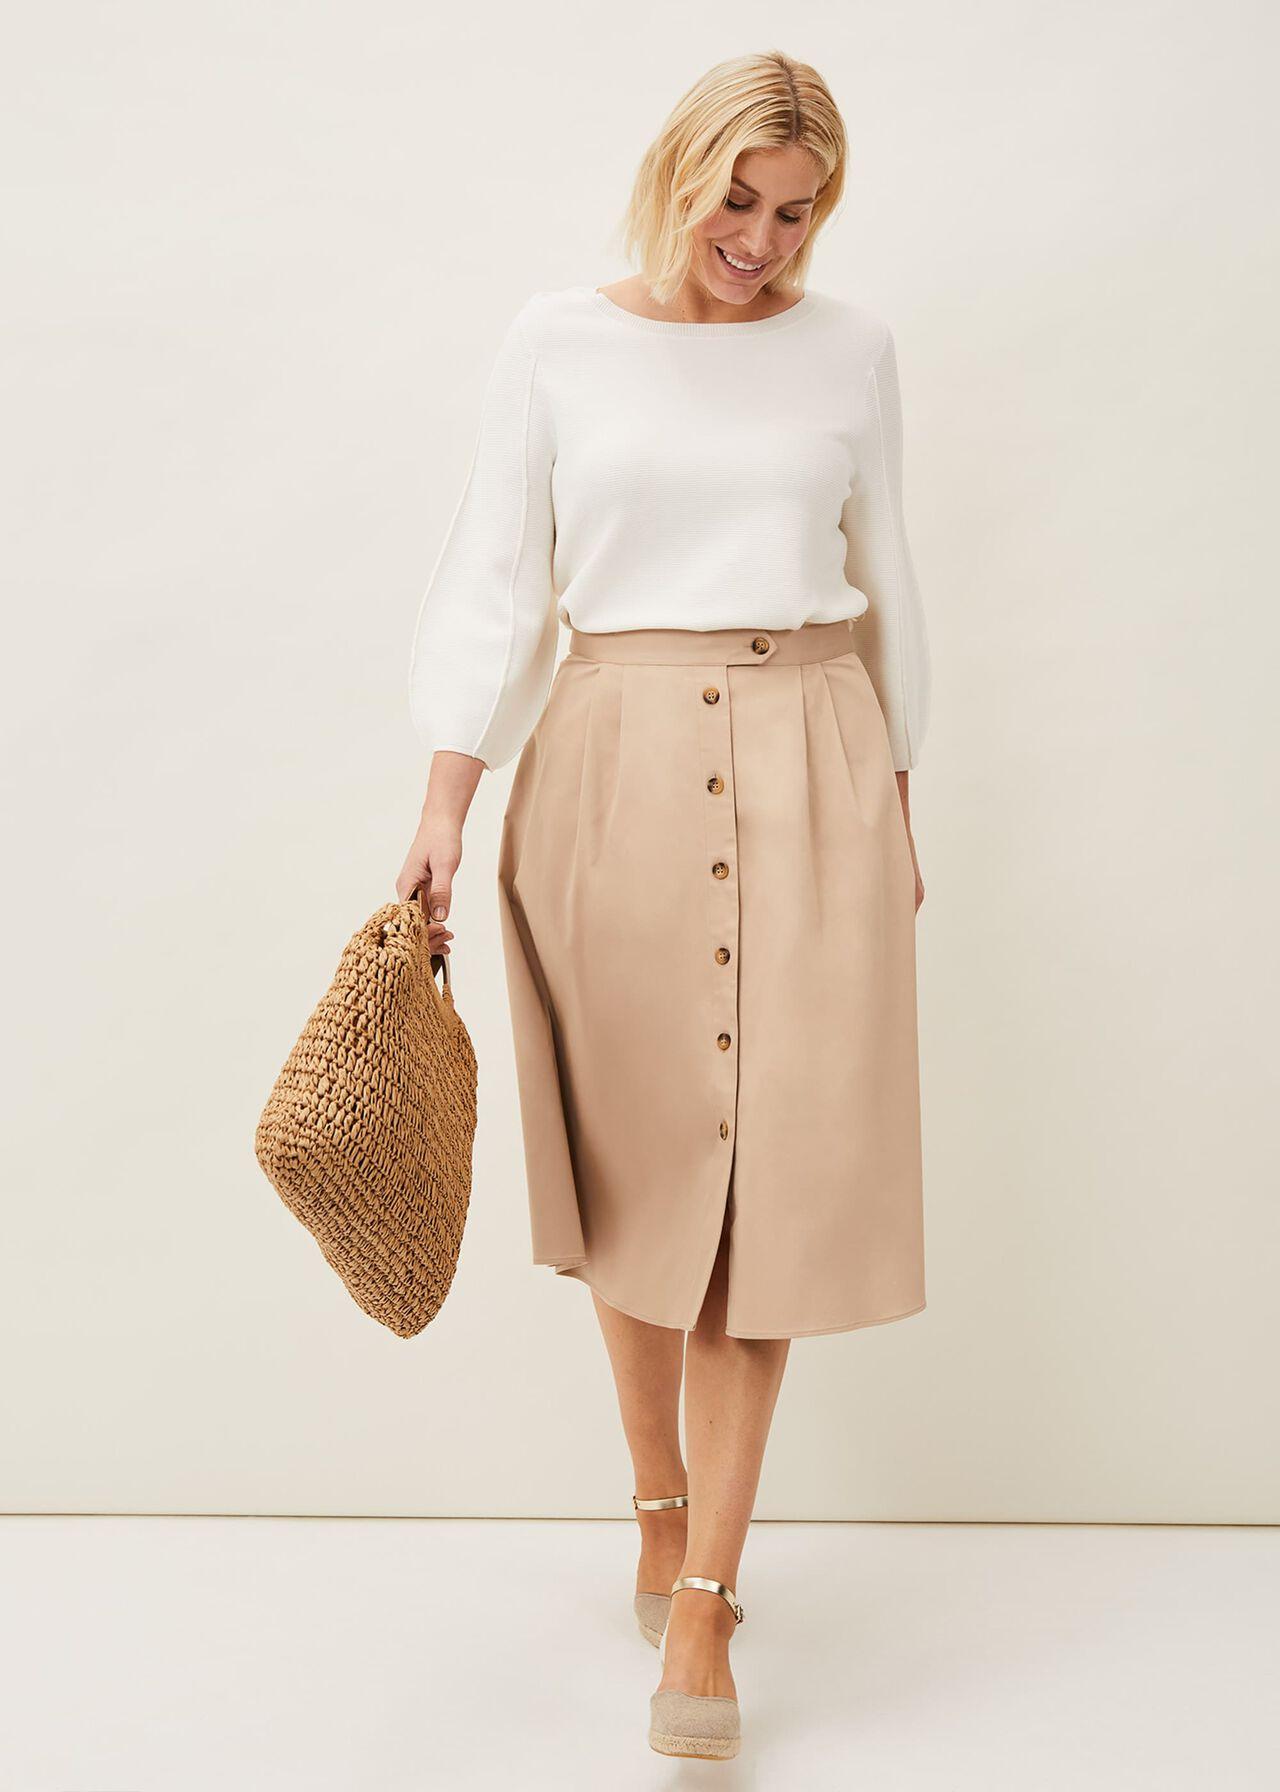 Artemisia A-Line Skirt